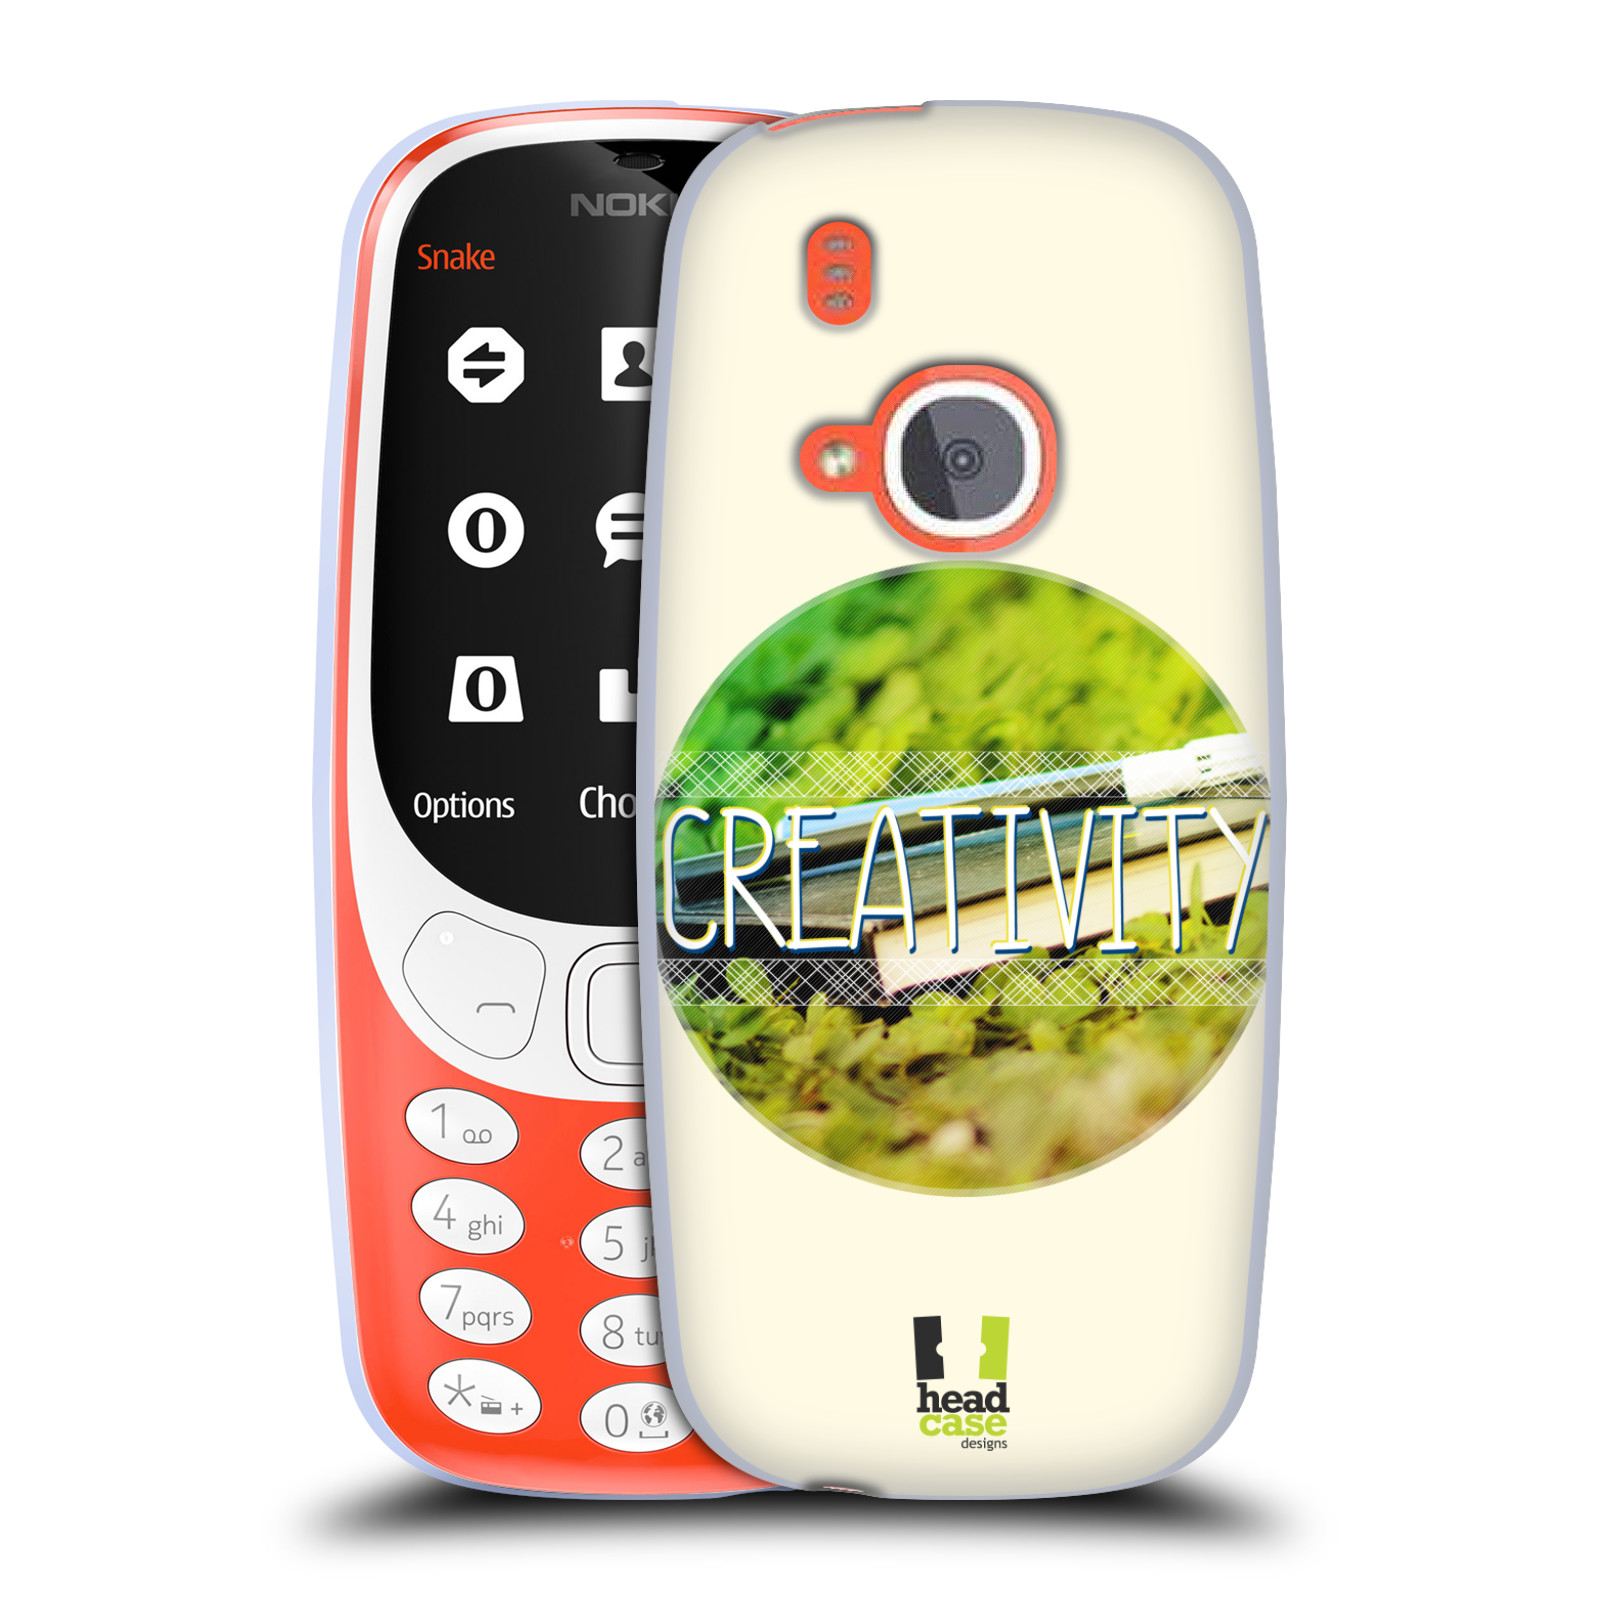 Silikonové pouzdro na mobil Nokia 3310 - Head Case - INSPIRACE V KRUHU KREATIVITA (Silikonový kryt či obal na mobilní telefon Nokia 3310 (2017) s motivem INSPIRACE V KRUHU KREATIVITA)